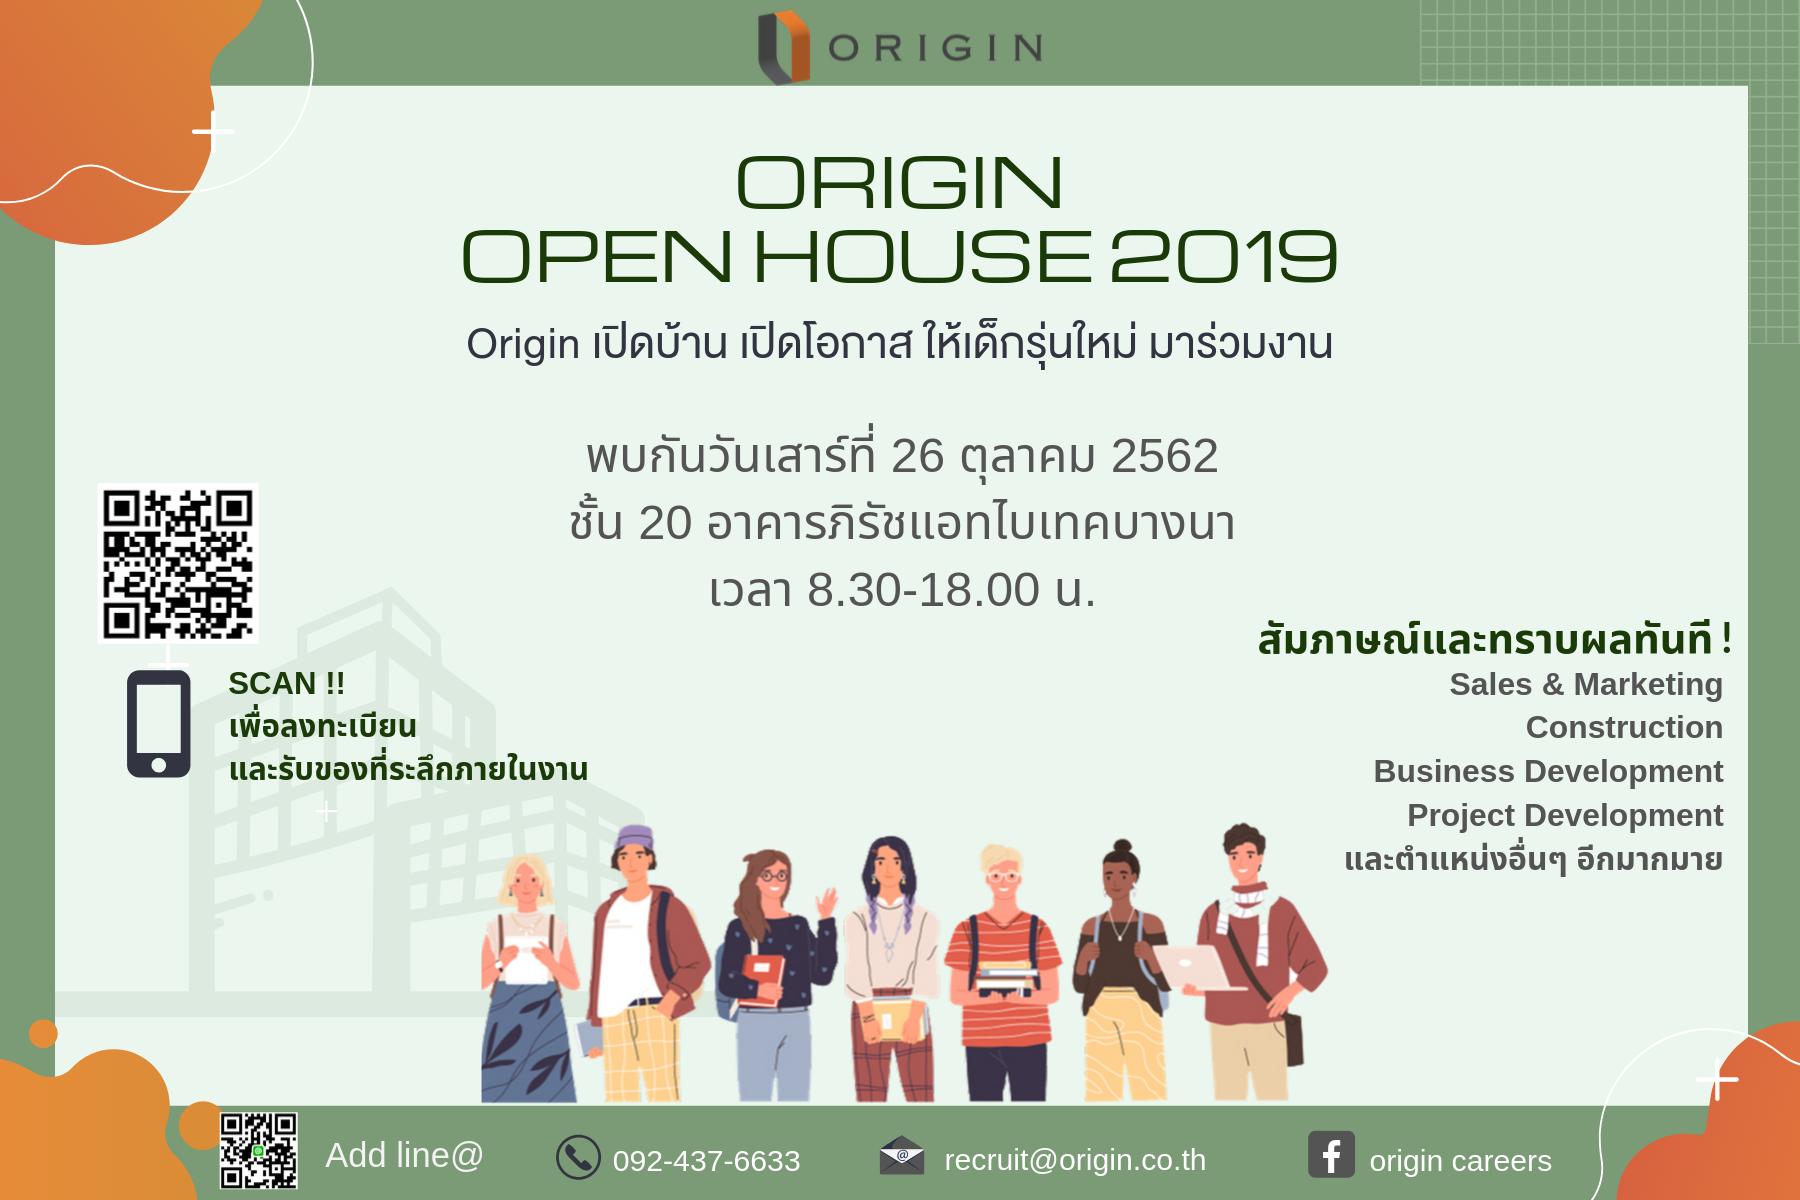 Origin Openhouse